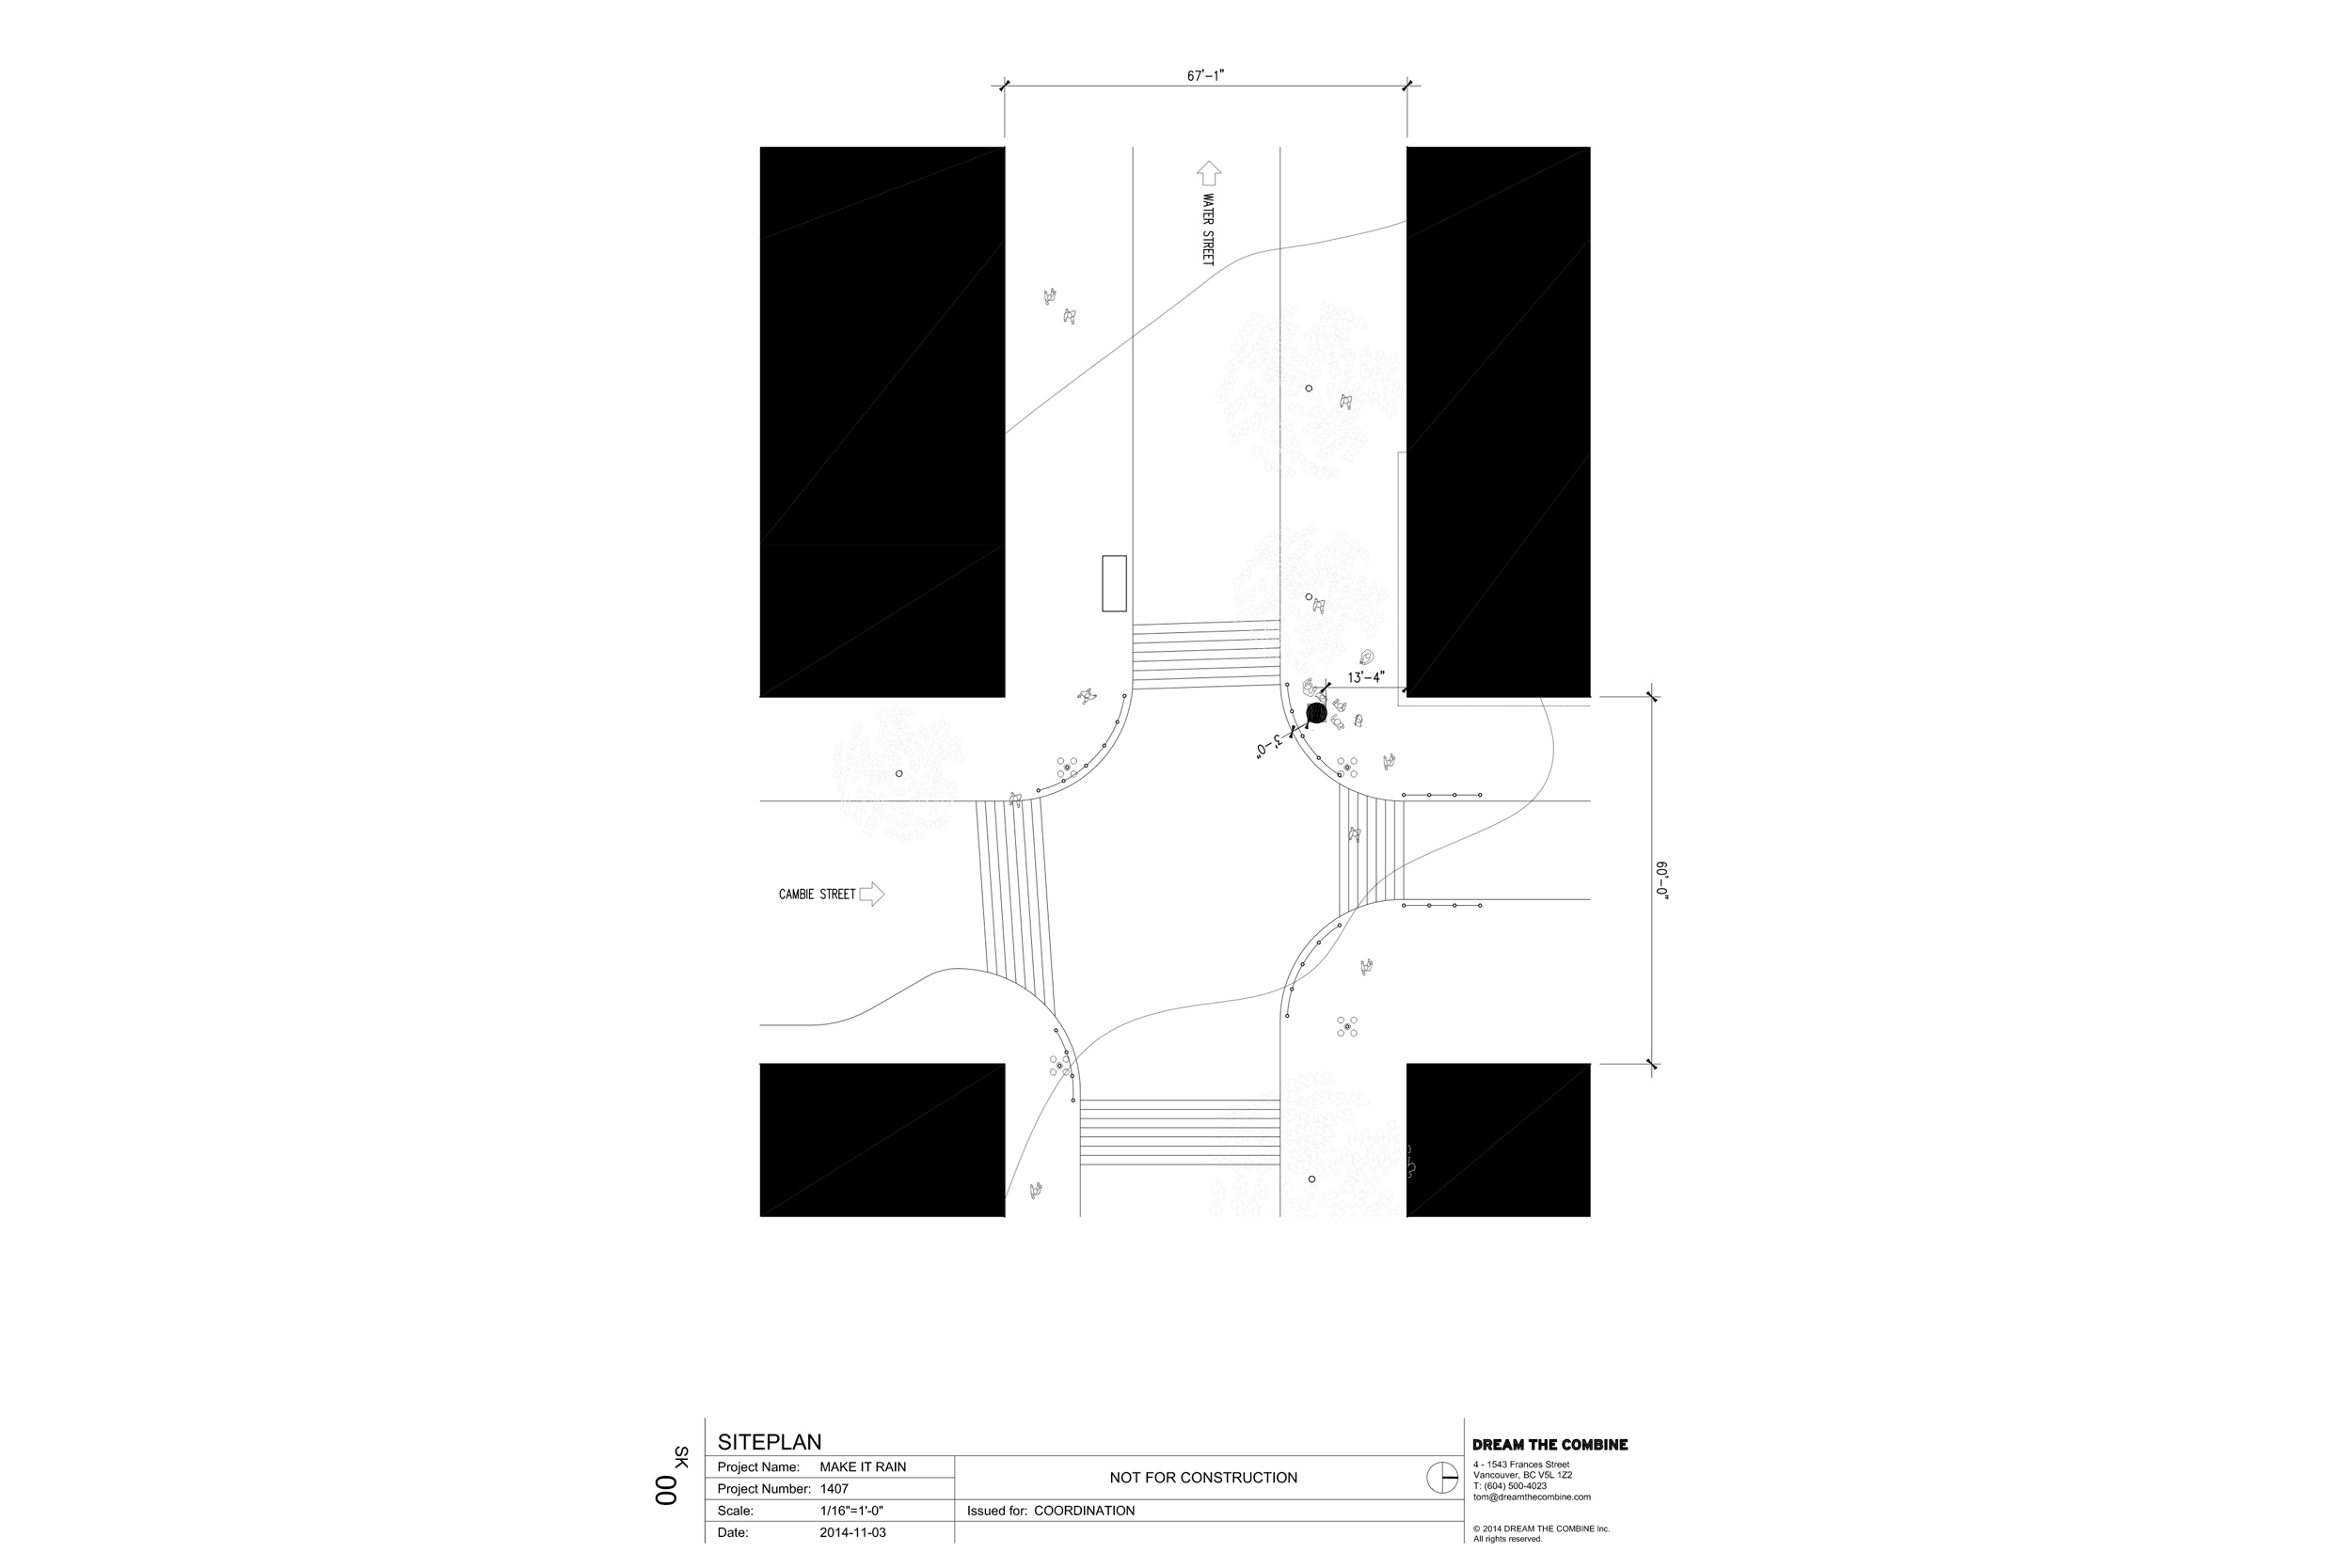 dtc-web_mir-process_dwgplan01.jpg